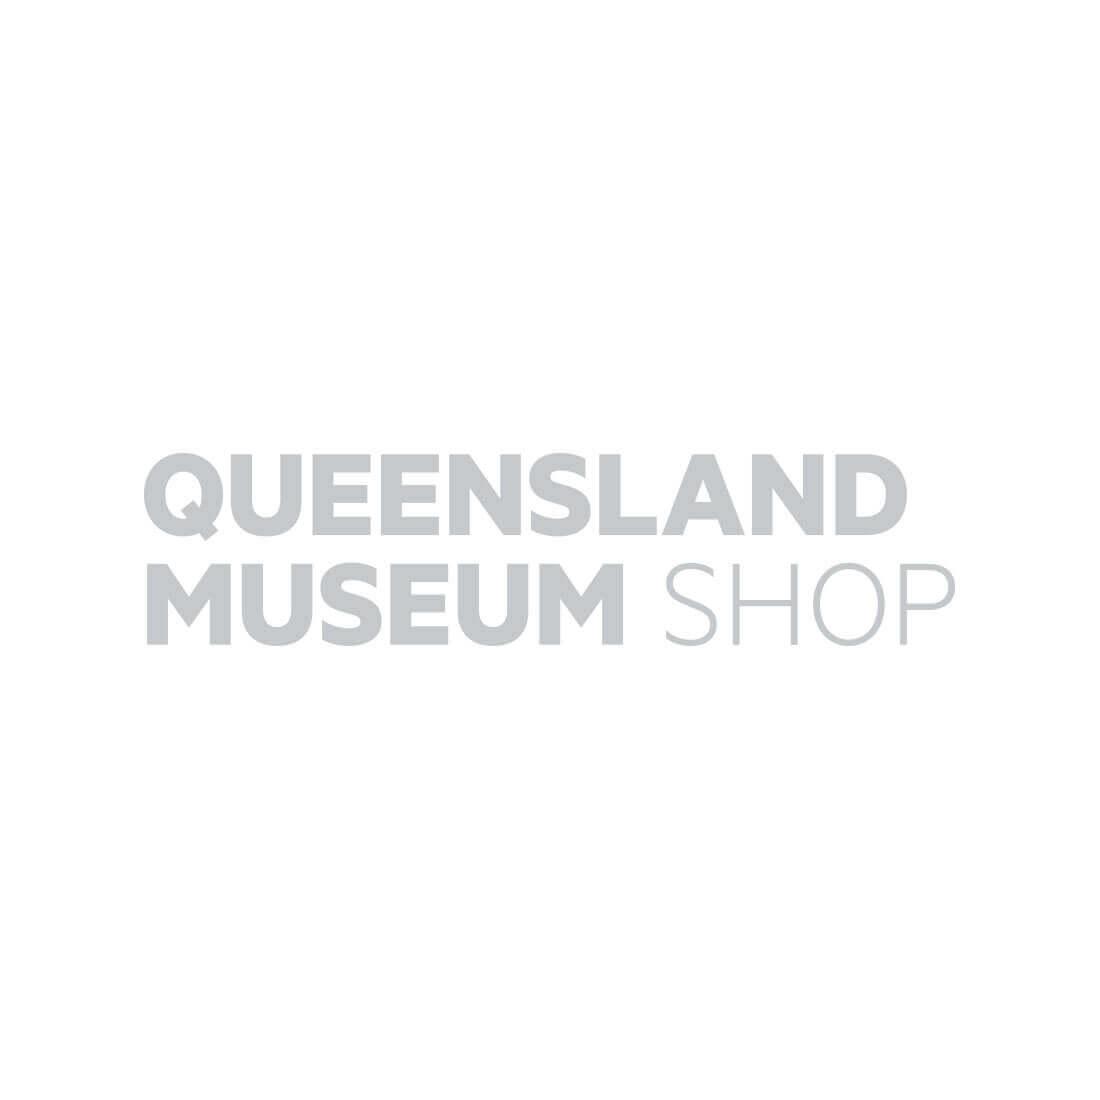 Locals MyMuseum Membership Renewal - CONCESSION*